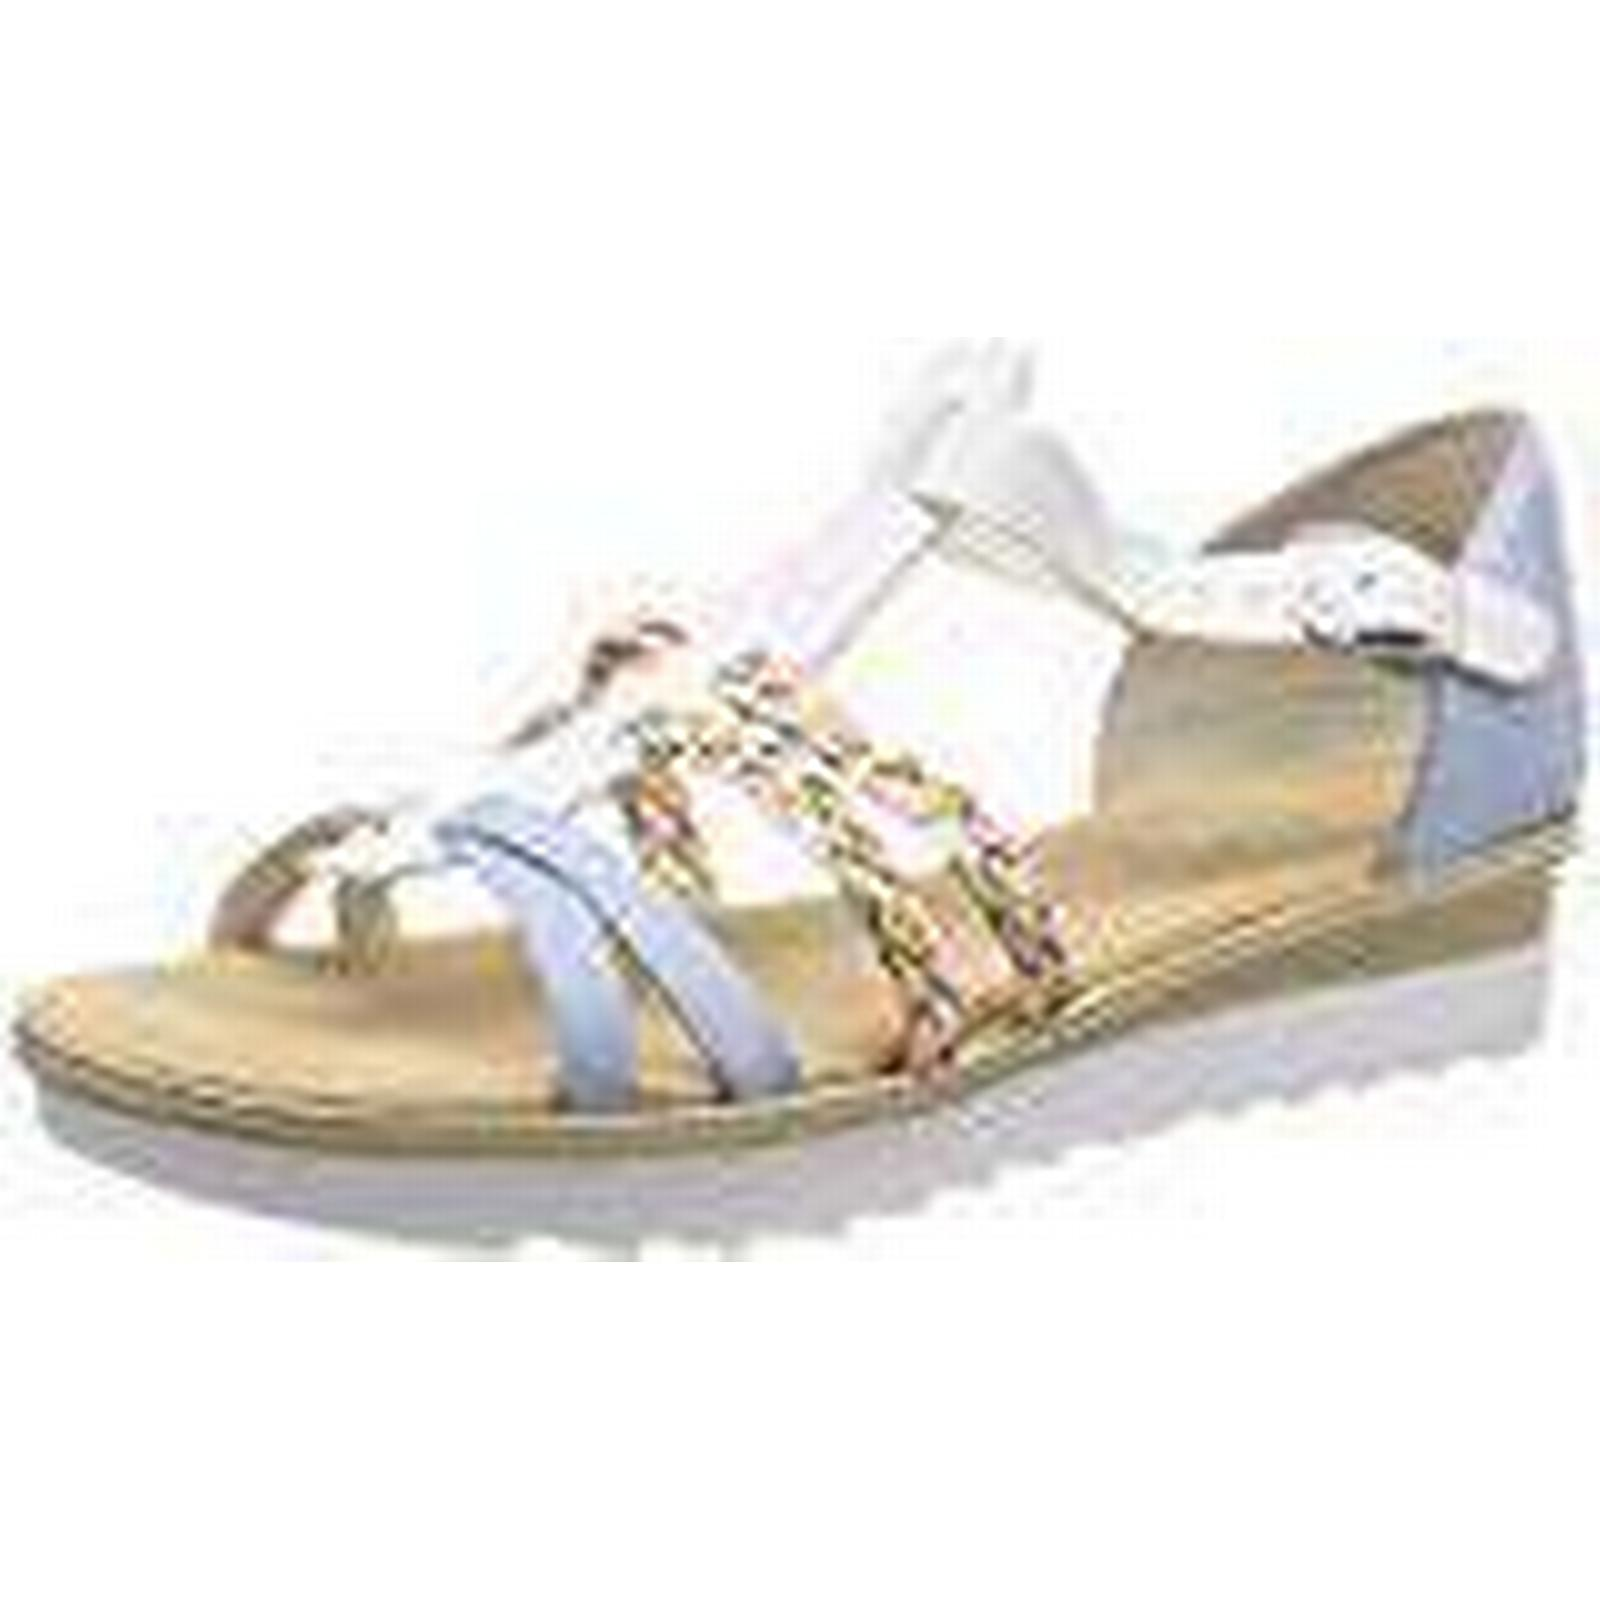 Rieker Women's 63198 UK Gladiator Sandals, Multicolour (Sky/Weiss/Rainbow 10), 7.5 UK 63198 7.5 UK 87be58